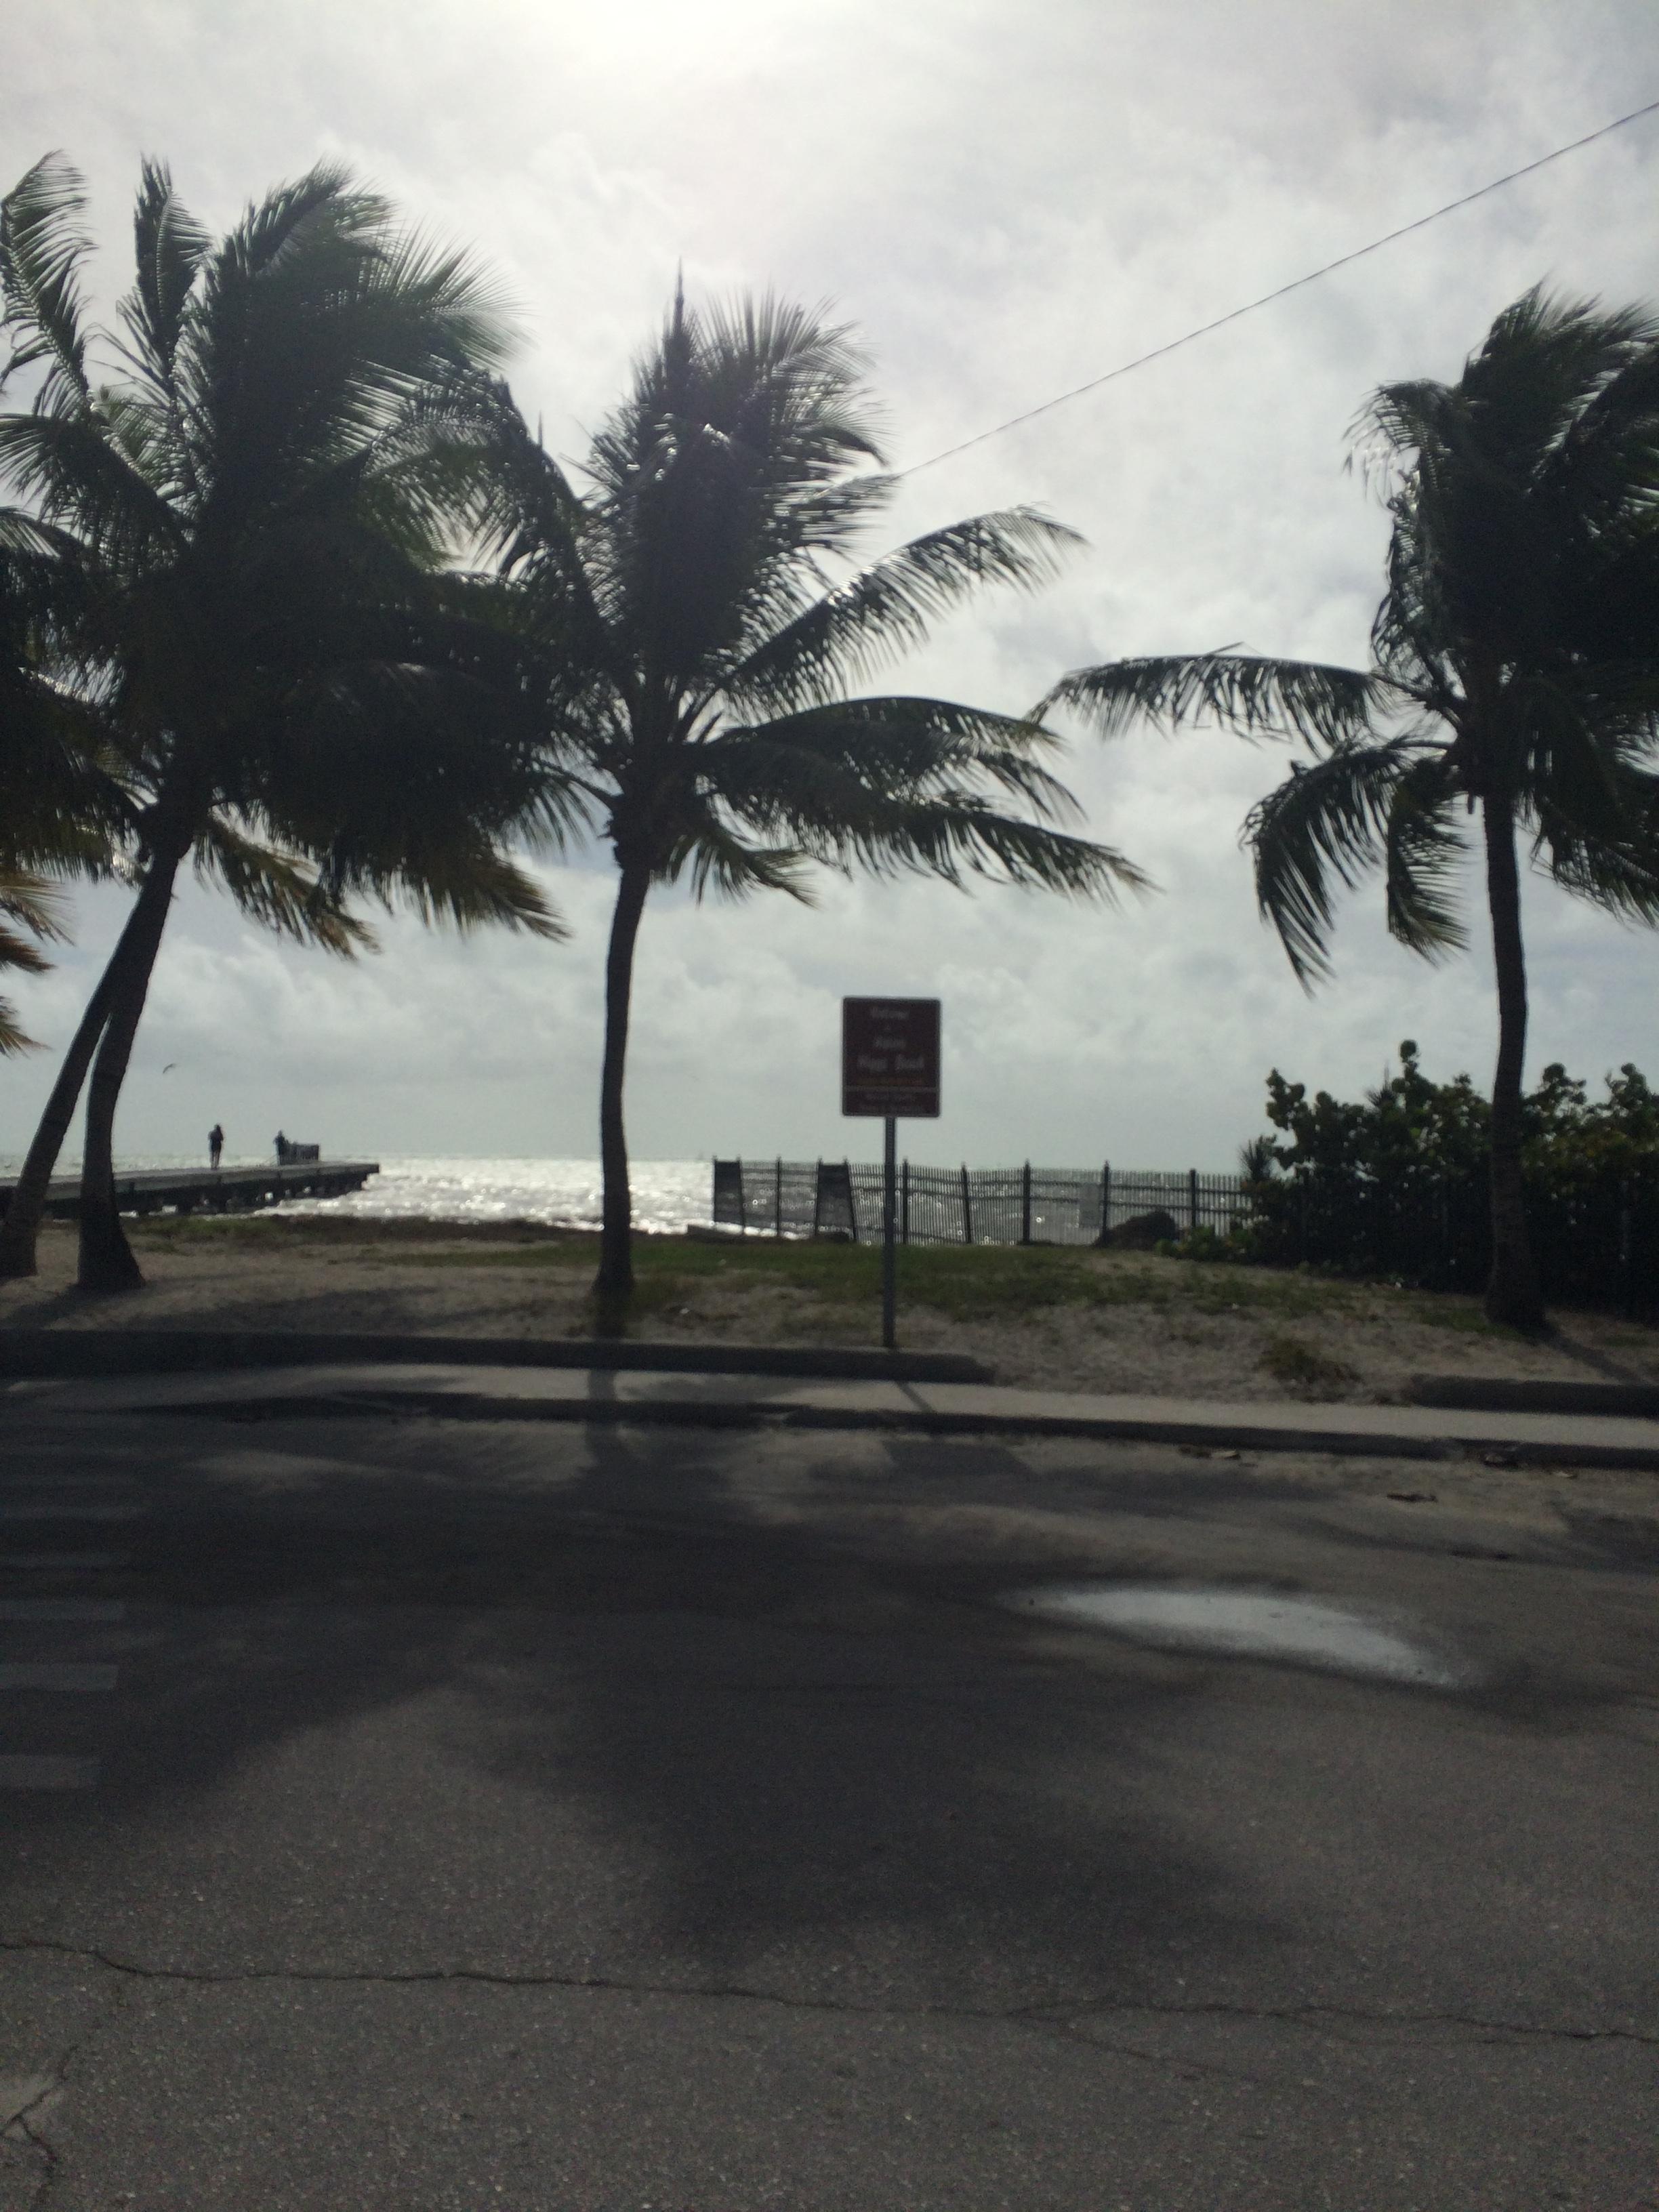 I went to Key West. But did I enjoy it?